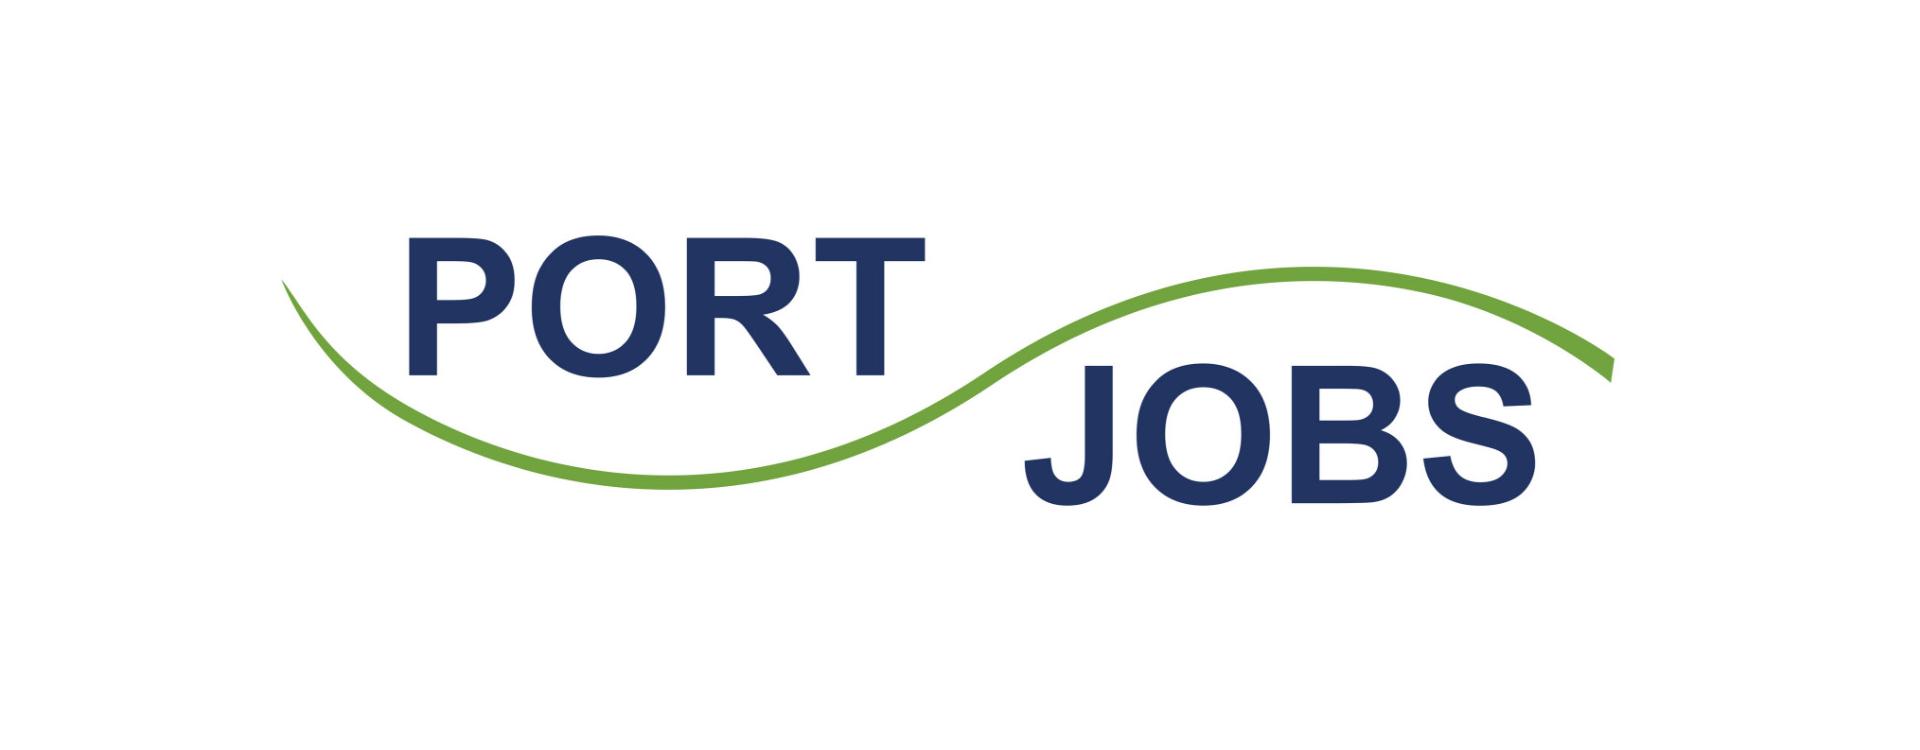 Port Jobs, Seattle